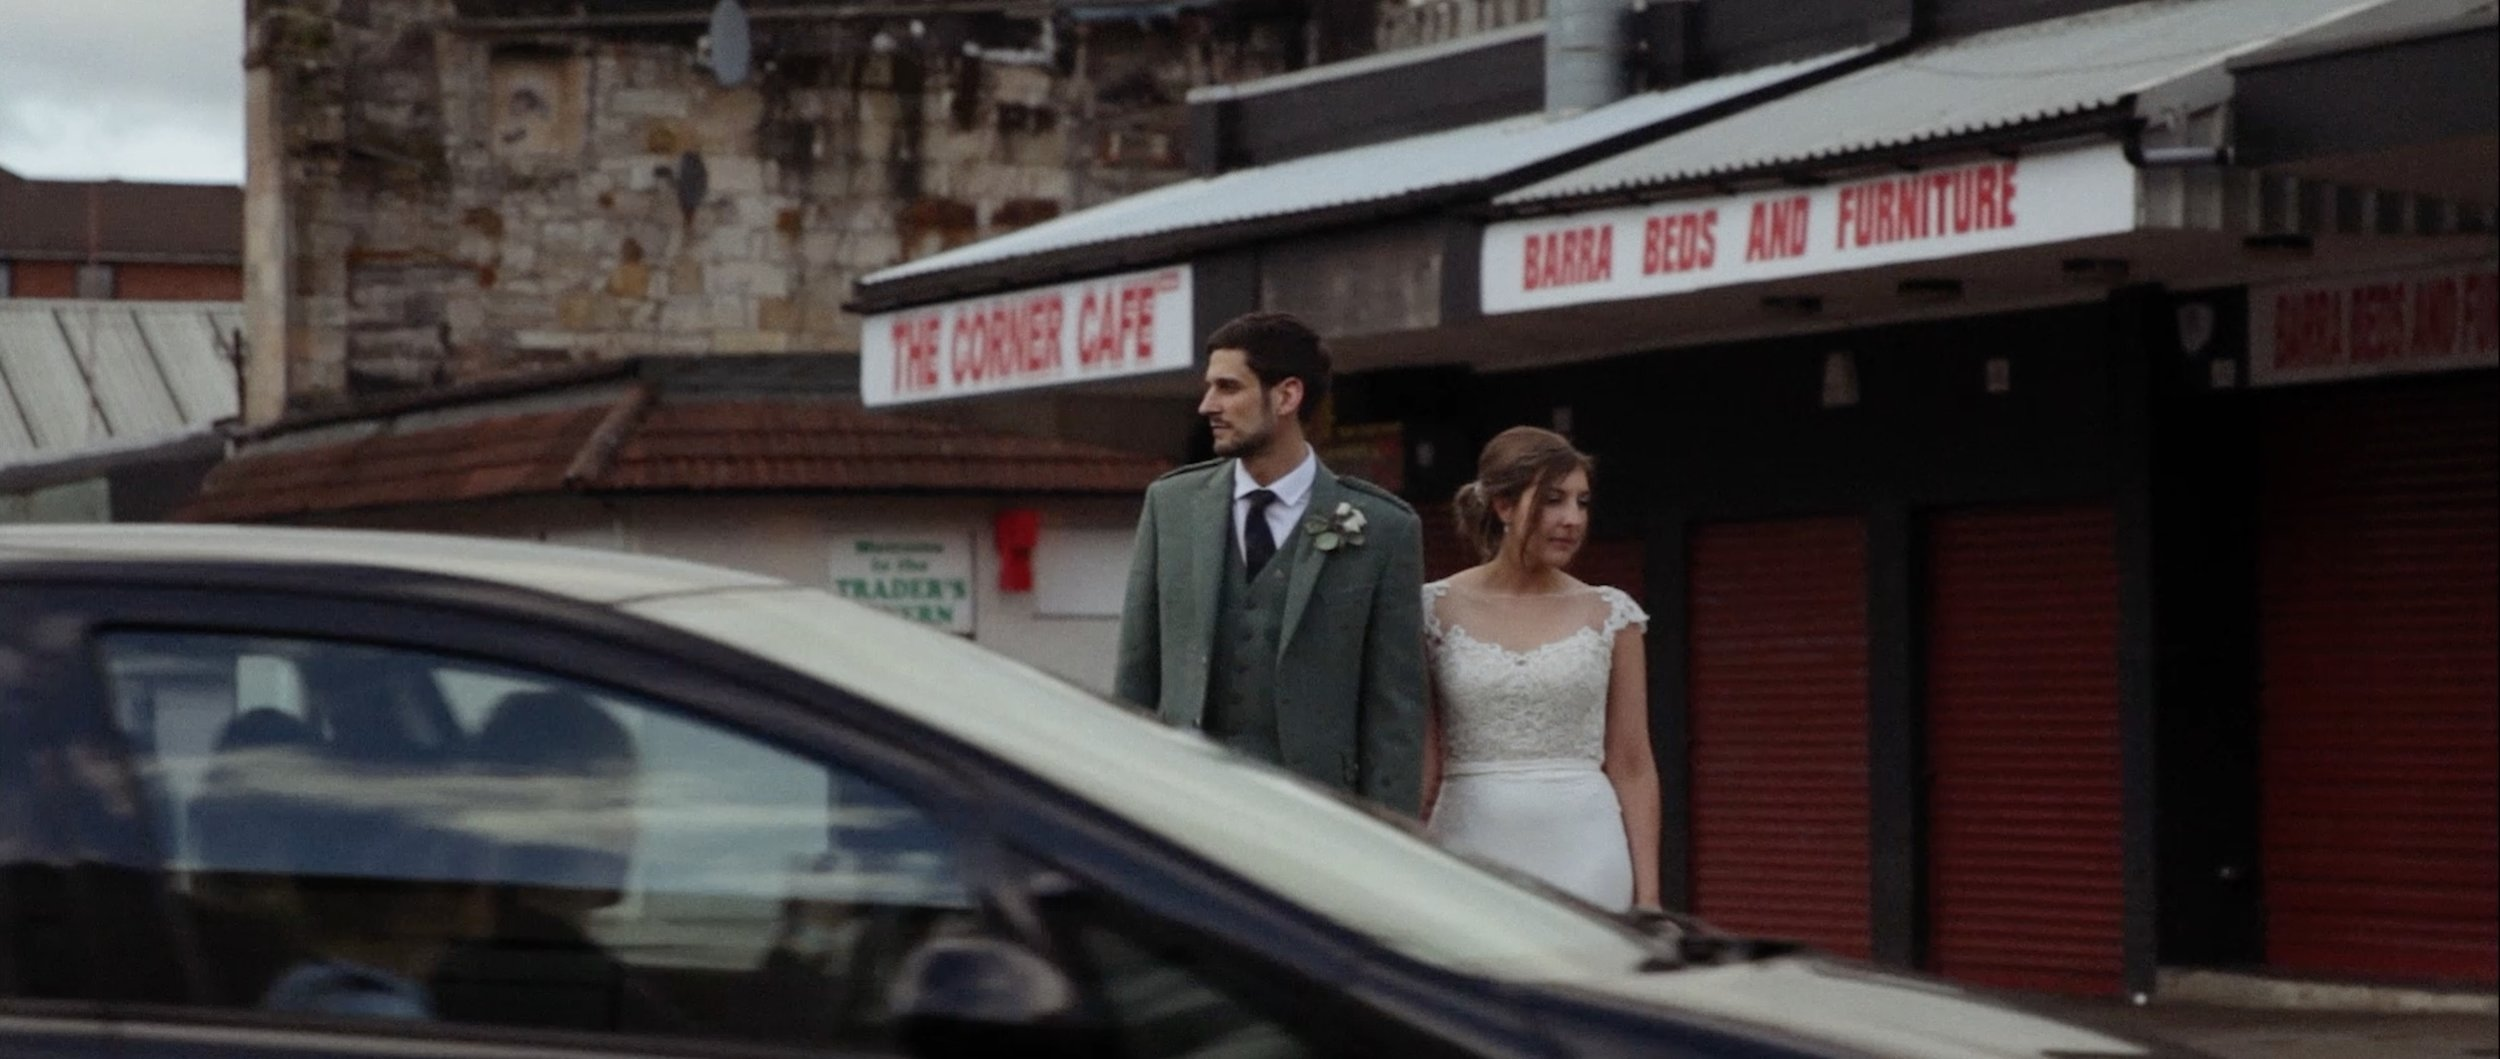 comrie-croft-wedding-videographer_LL_05.jpg